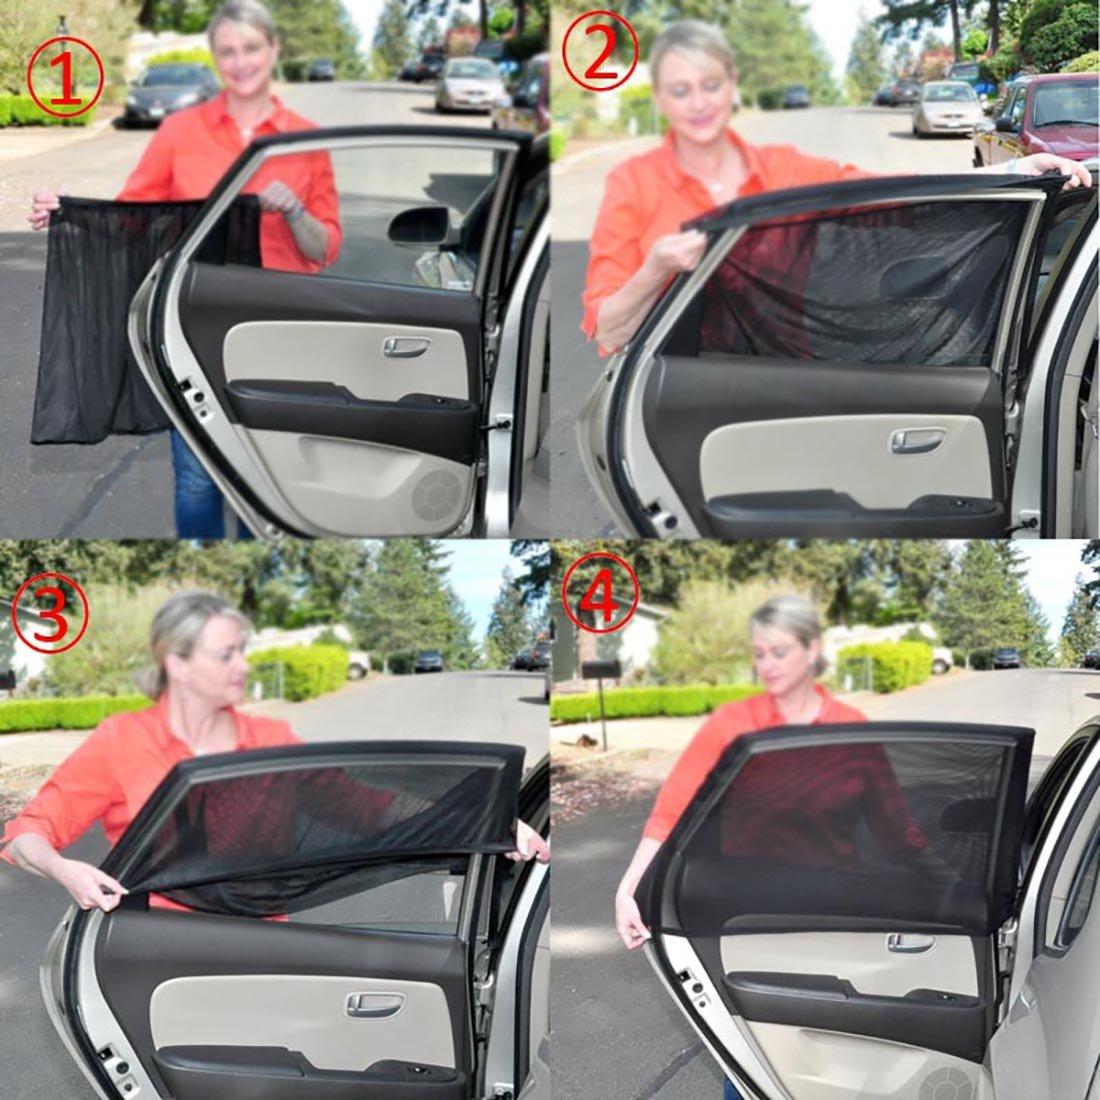 Auto Fenster-Blenden Sonnenblenden f/ür Kinder 2er Pack